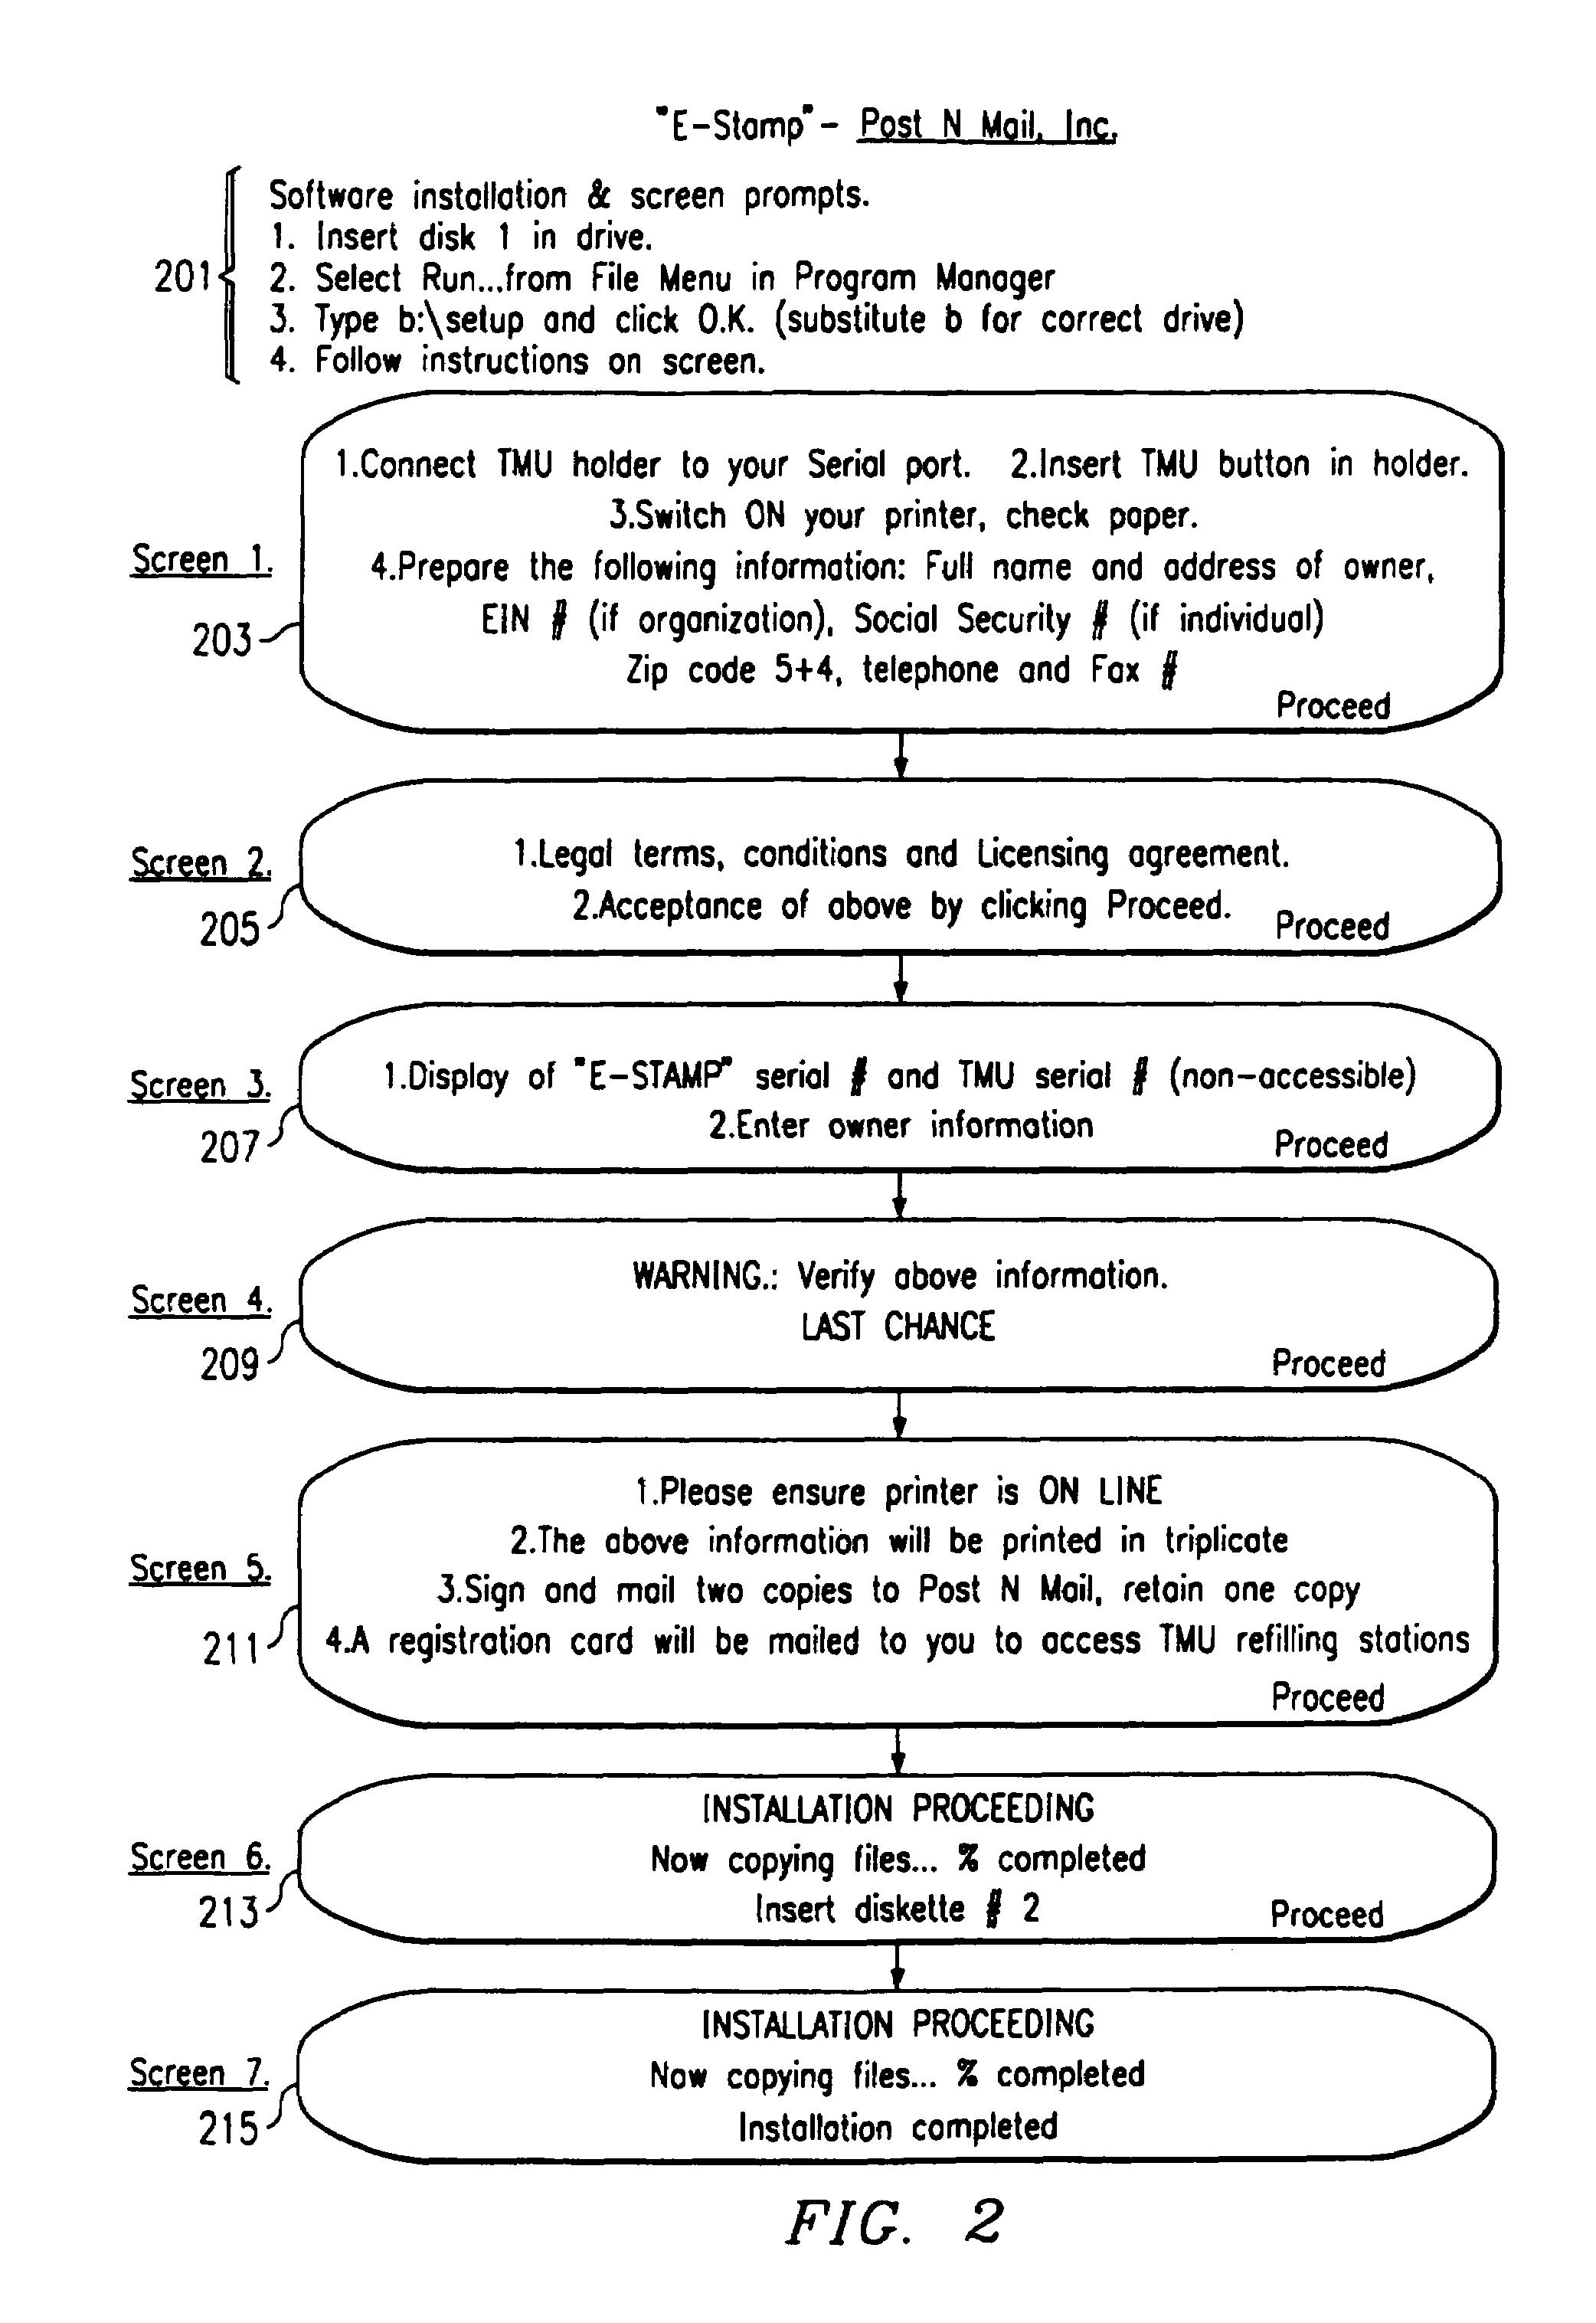 Patent US 7,711,650 B1